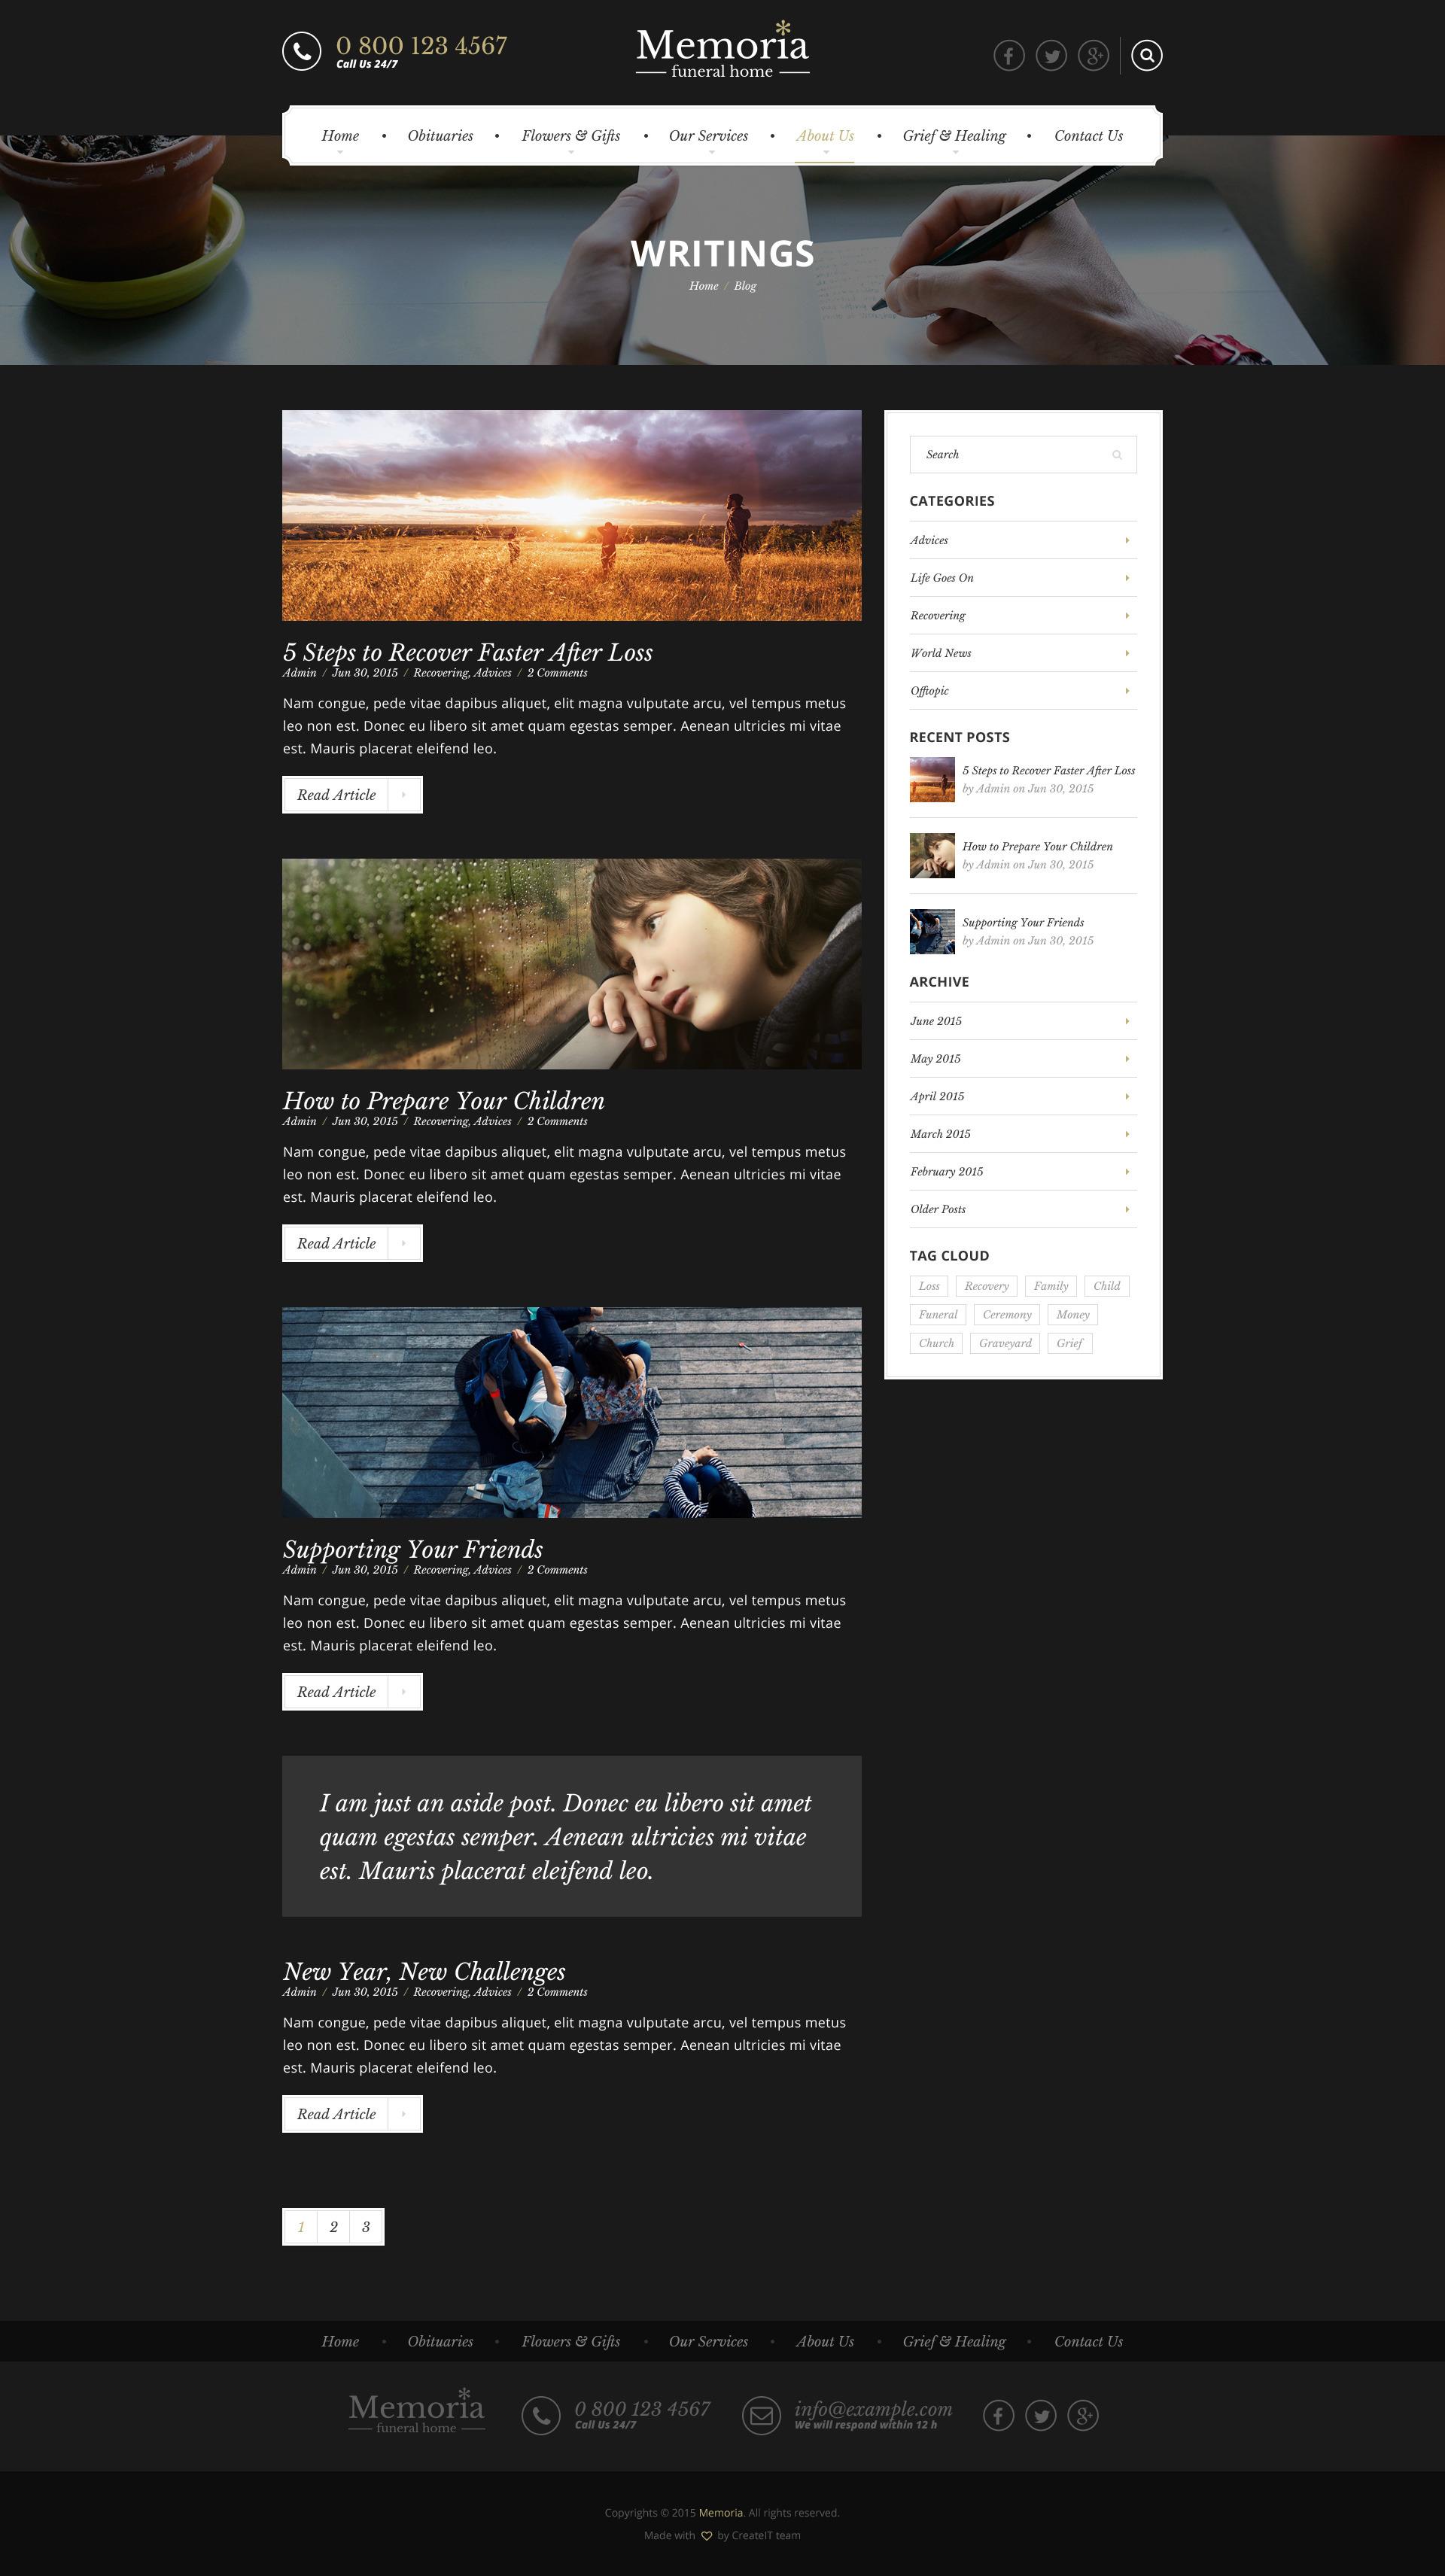 memoria - funeral home html templatecreateit-pl   themeforest